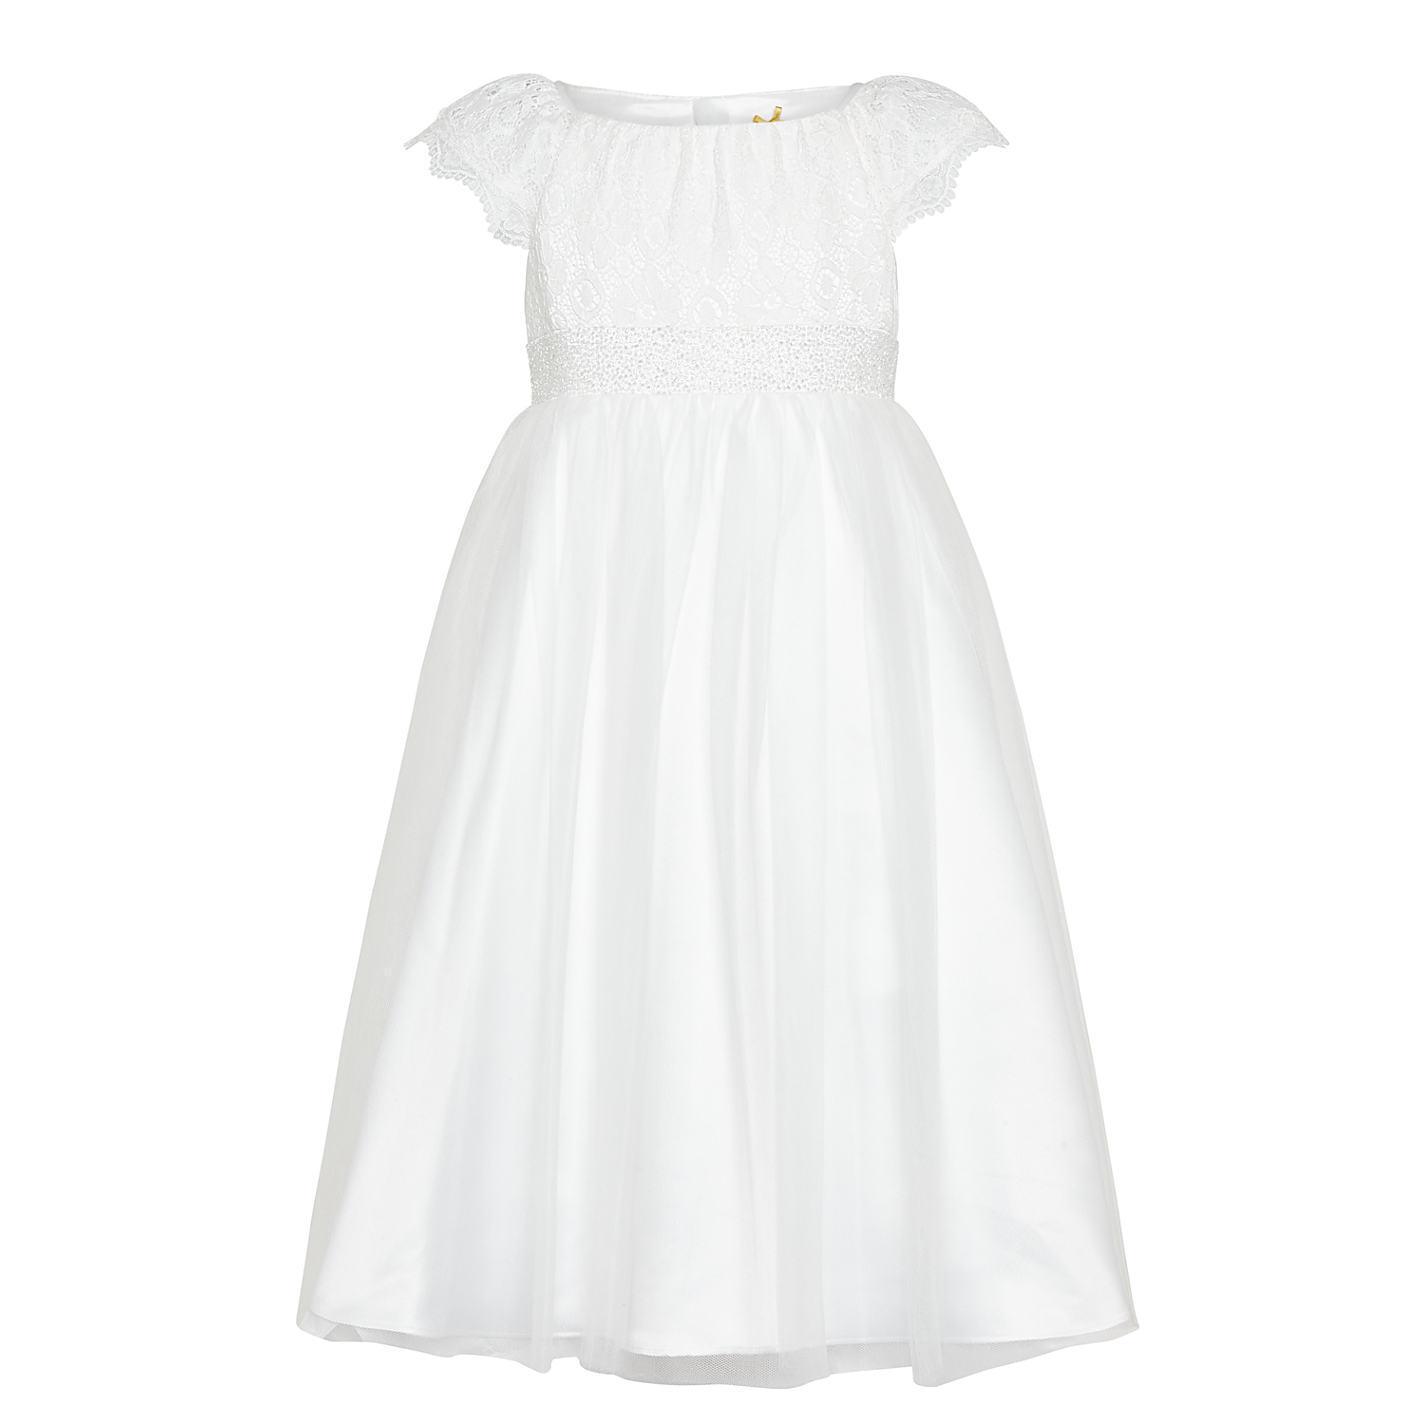 John Lewis Lace Mesh Bridesmaid Dress Ivory Age 3 Years rrp DH081 TT 04